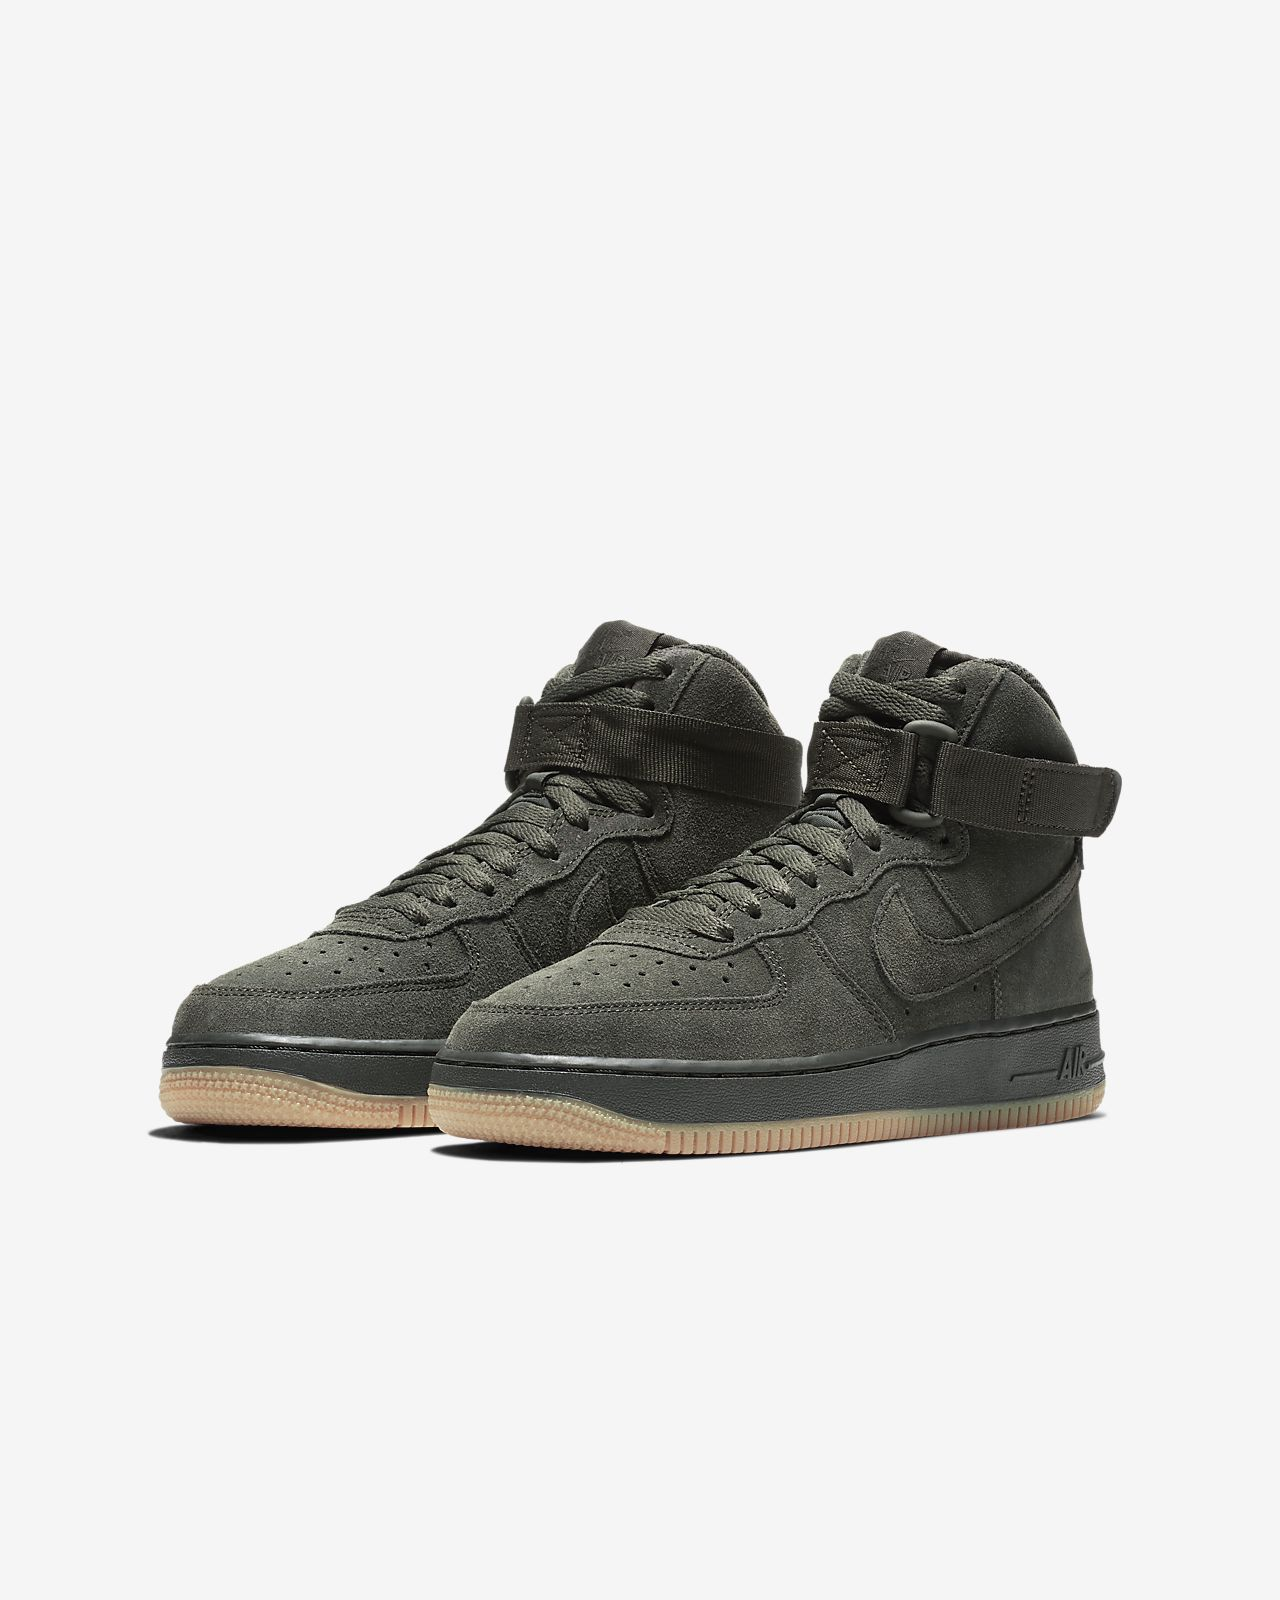 new arrival 81a65 c0eaf ... Nike Air Force 1 High LV8 Older Kids  Shoe